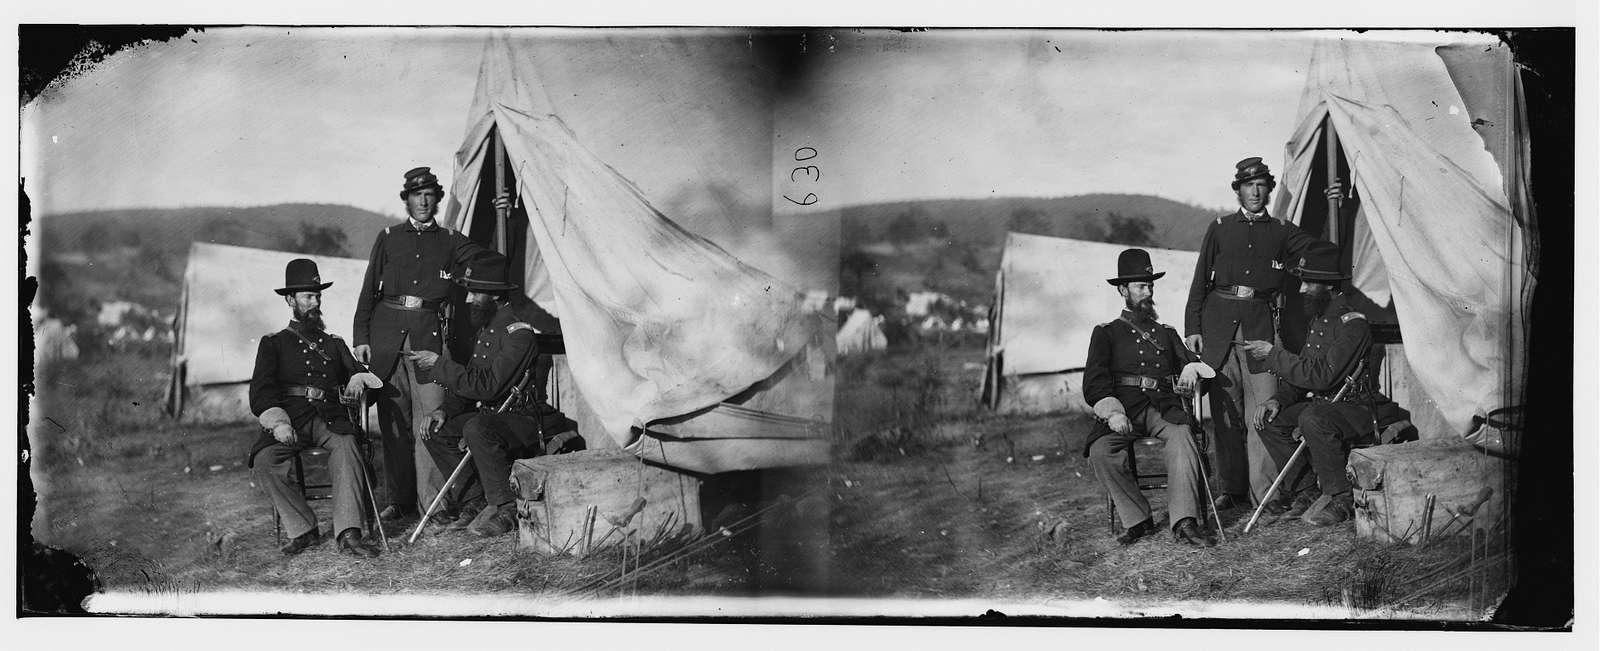 Antietam, Md. Col. John S. Crocker, Lt. Col. Benjamin C. Butler, and adjutant of 93d New York Volunteers